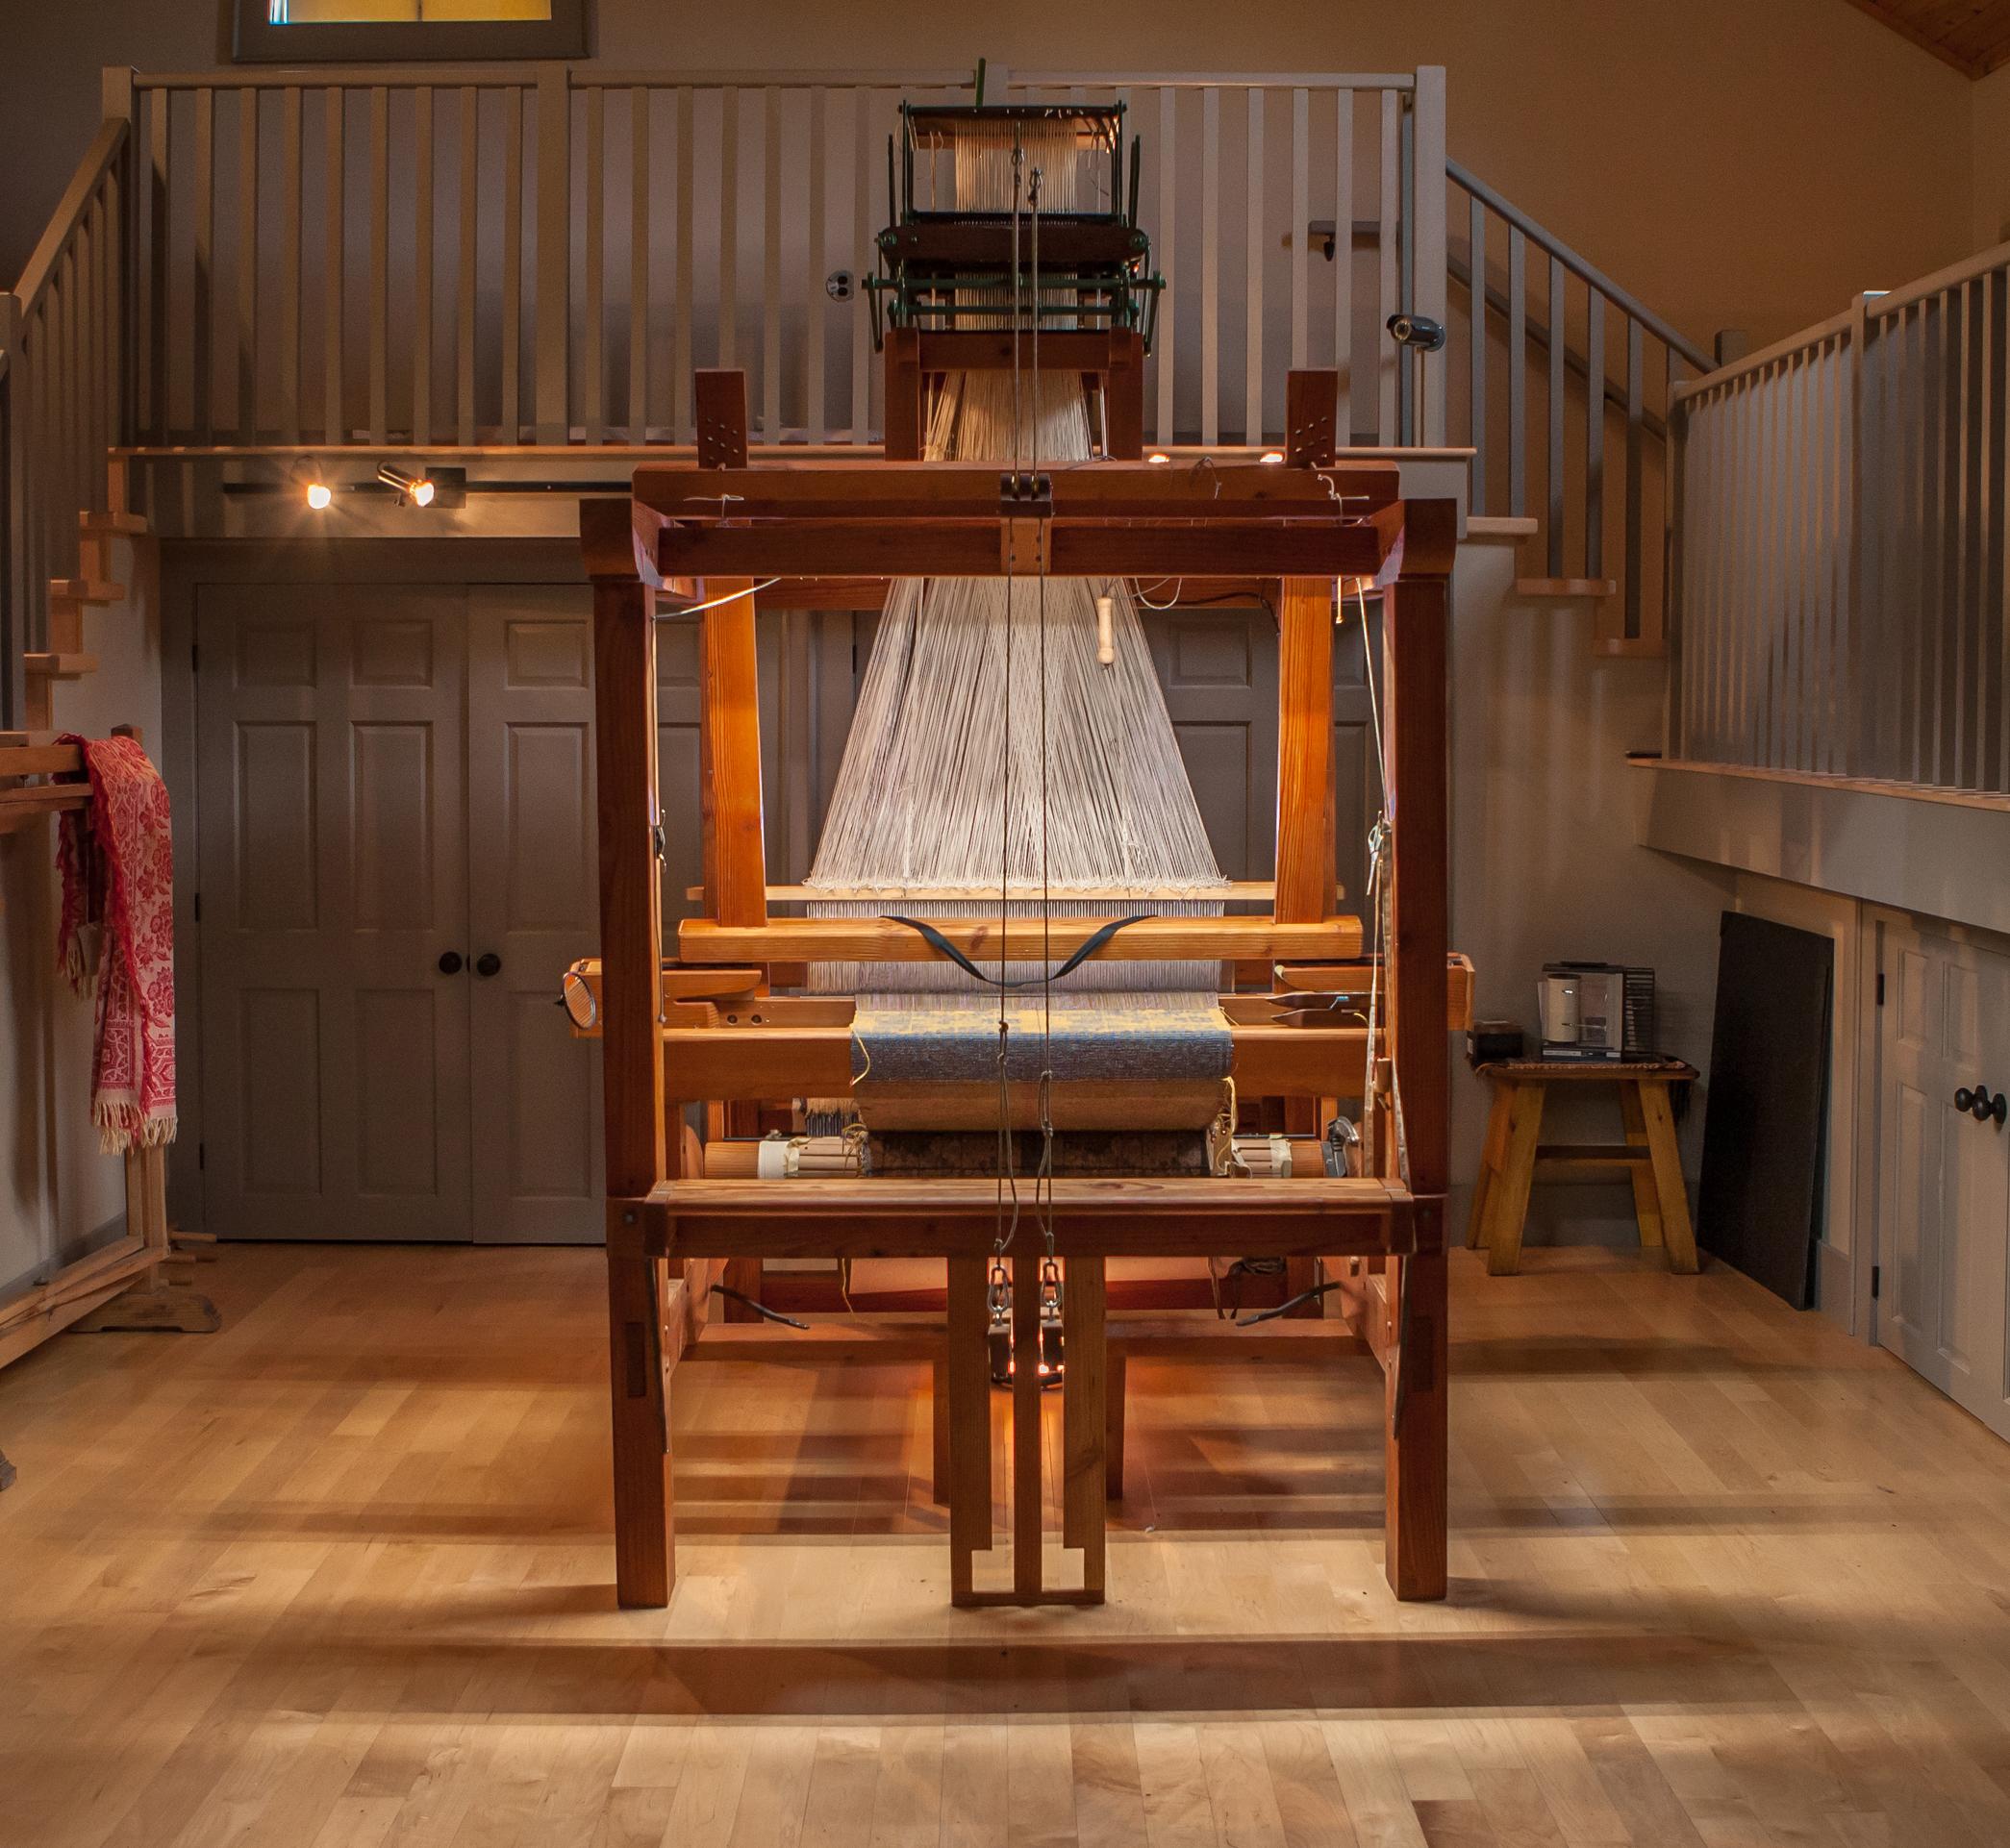 S  W  Lowry Weaver Shop & Jacquard Loom Interpretive Centre